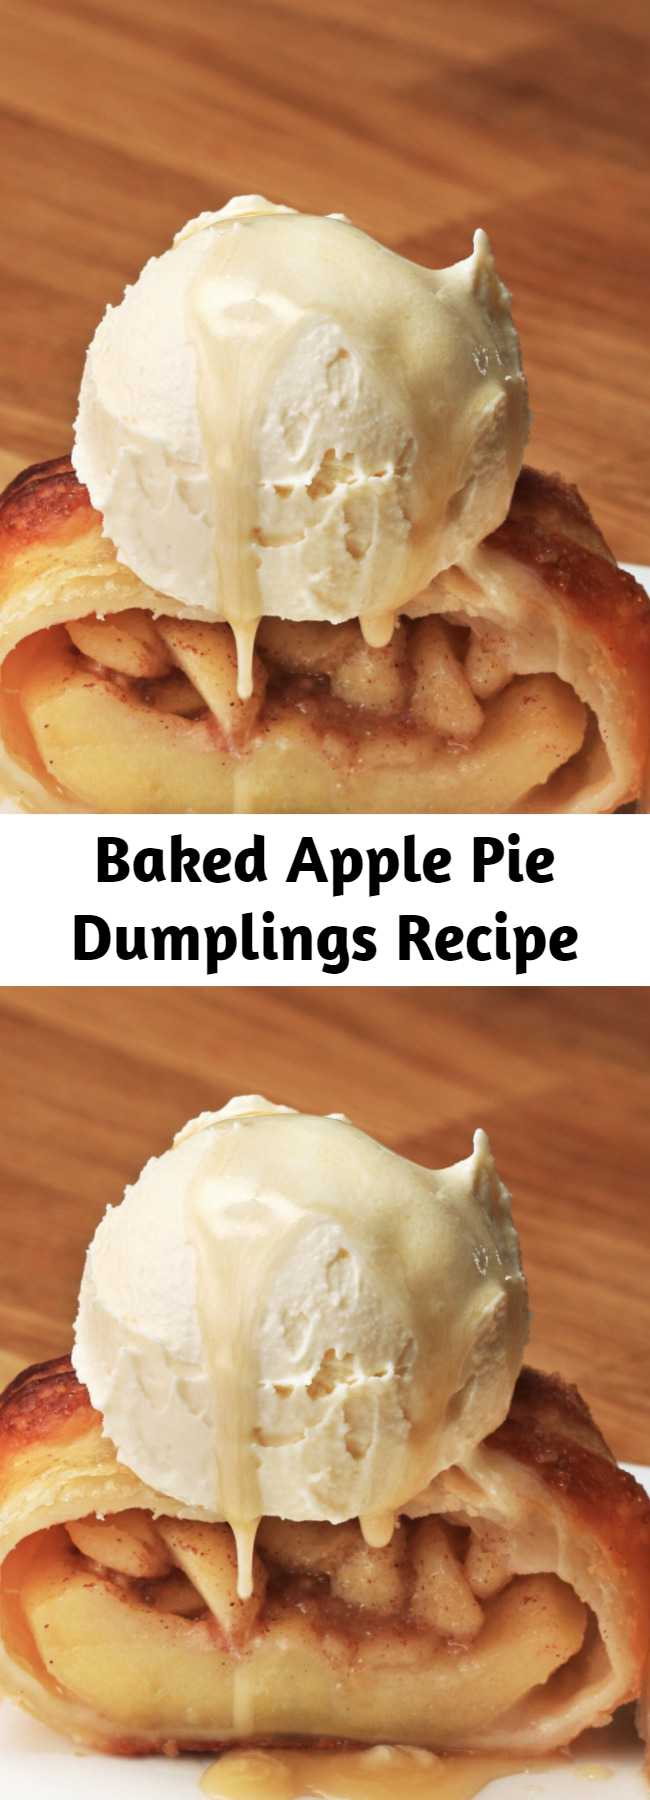 Baked Apple Pie Dumplings Recipe - Snuggle up for Fall with these Apple Pie Dumplings!